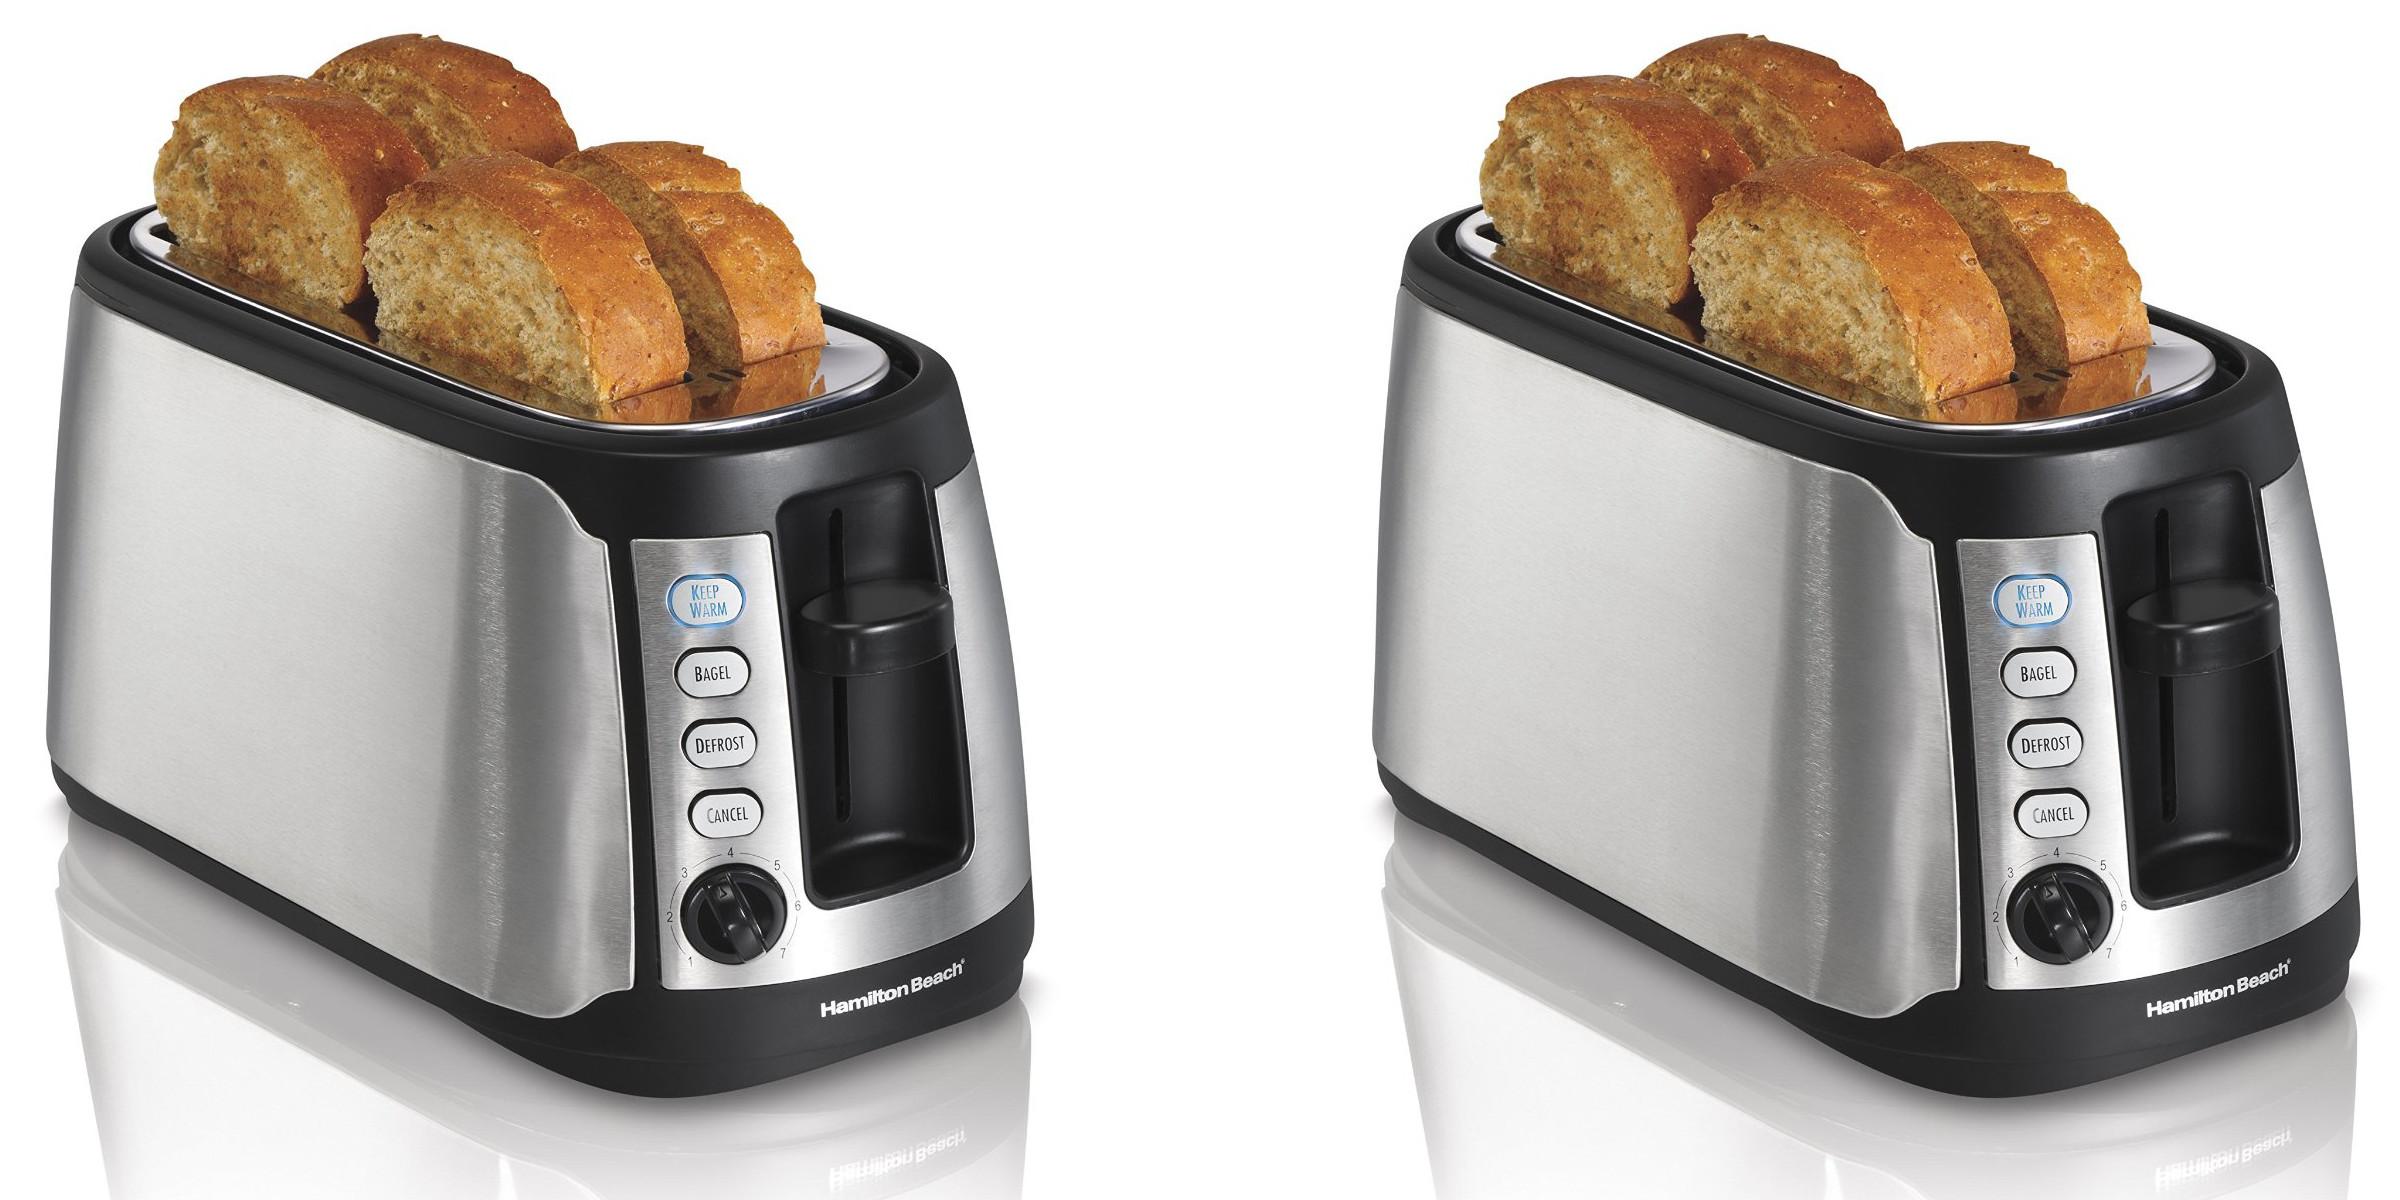 hamilton-beach-4-slice-long-slot-keep-warm-toaster-4